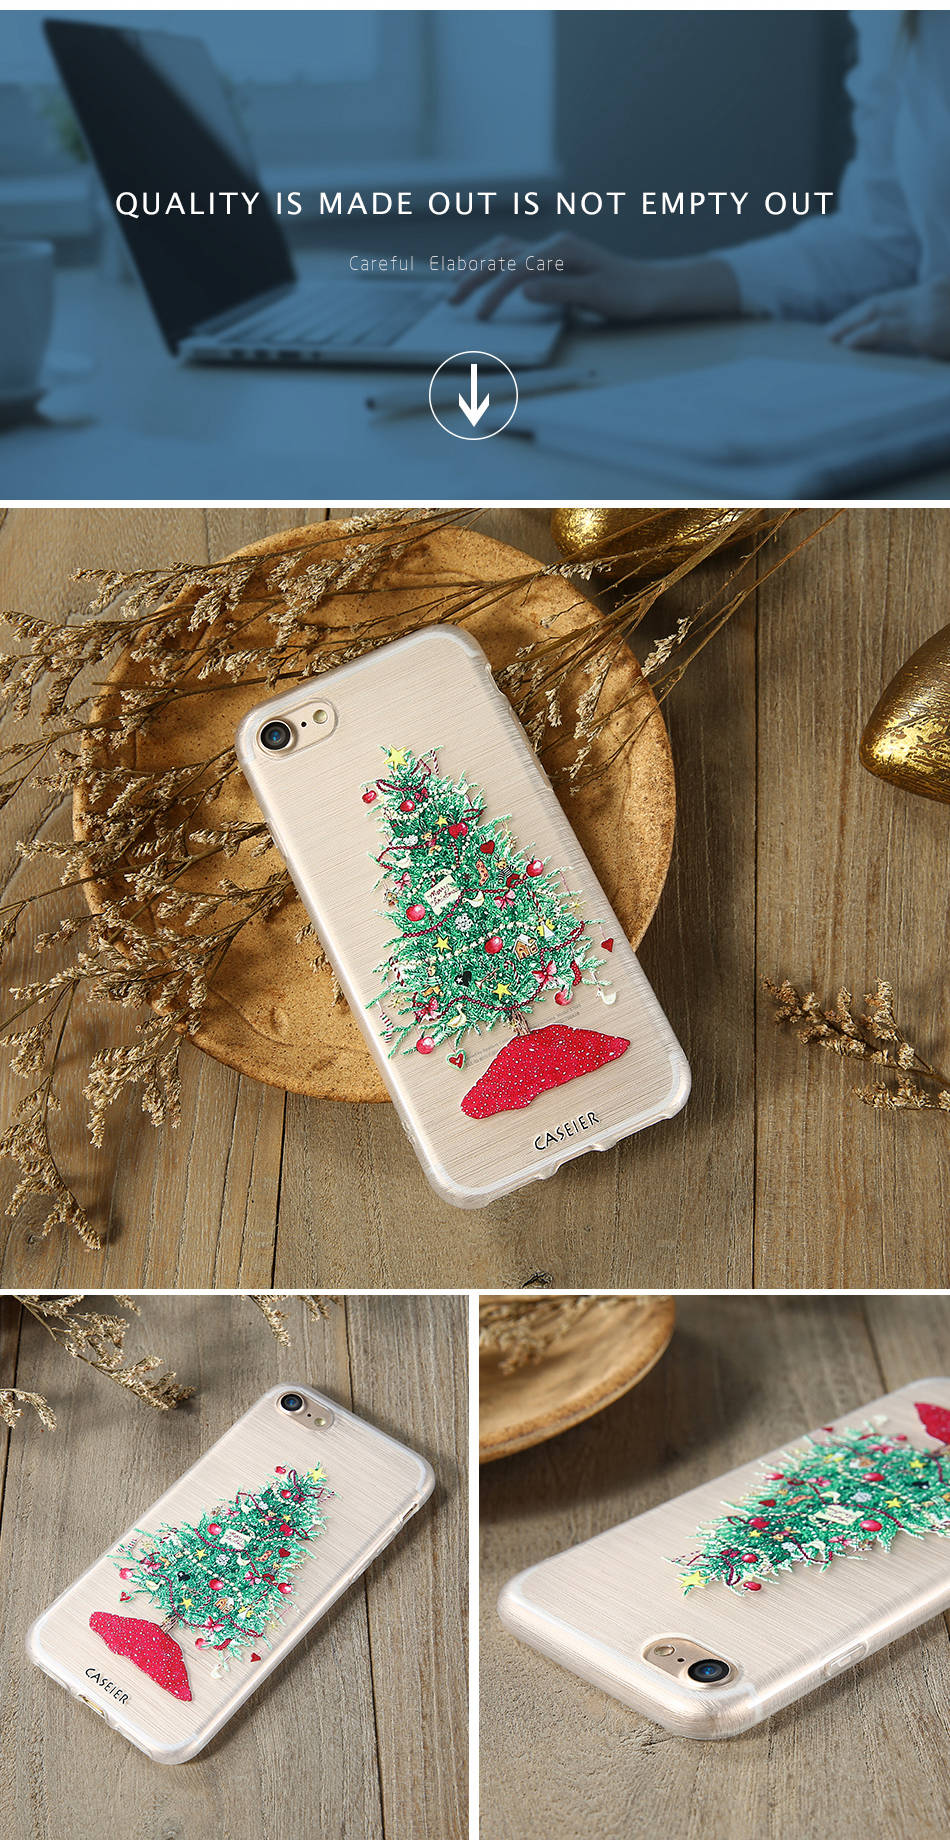 HTB1jiLVOpXXXXXPaXXXq6xXFXXXS - Christmas Phone Case For iPhone 7 6 6S Plus iPhone 5S SE 5 Cases For Samsung Galaxy S6 S7 Edge Cute Cover Accessories PTC 286